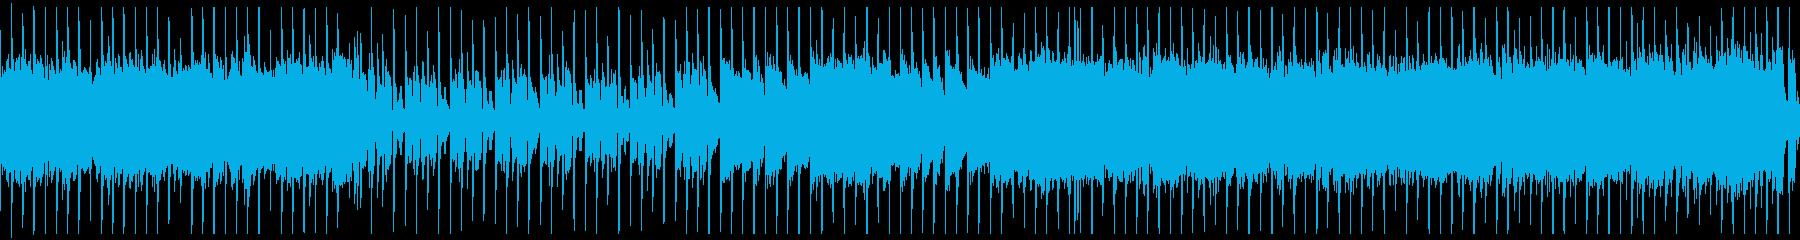 Chiptune four-on-the-floor lock loop's reproduced waveform